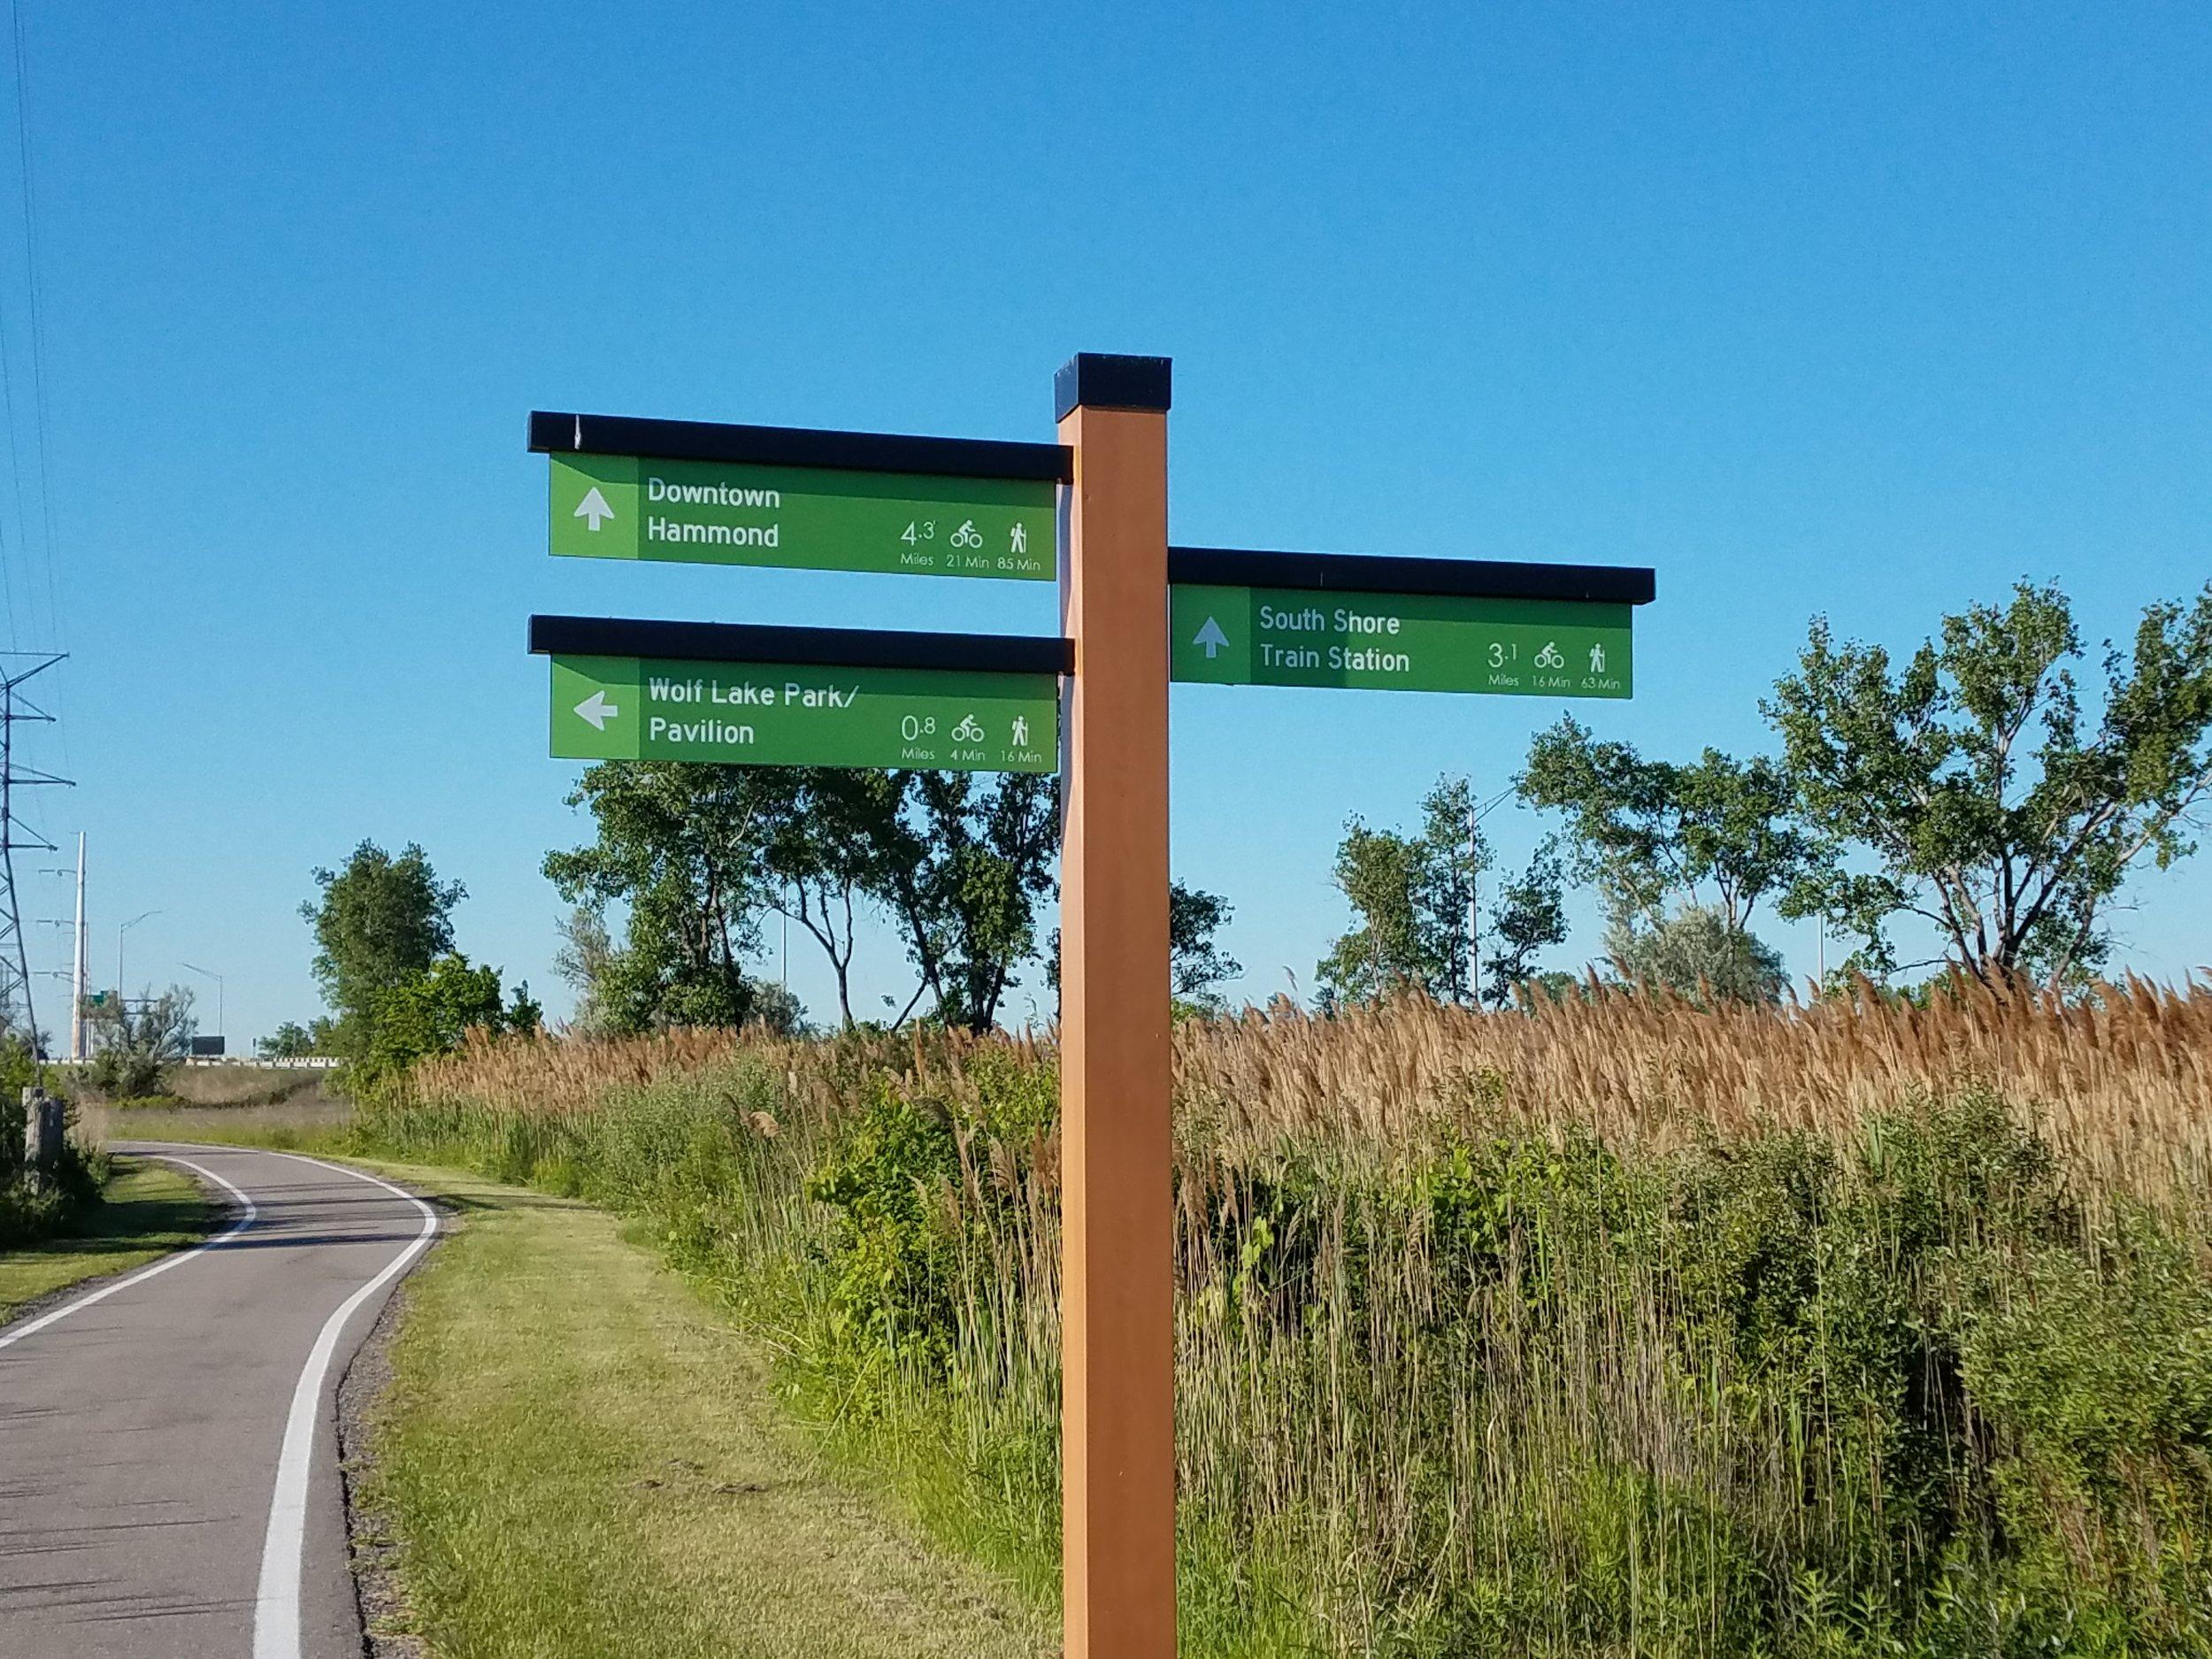 2018-06-005 - Hammond Trail Mileage  Markers - Hammond, Indiana.jpg